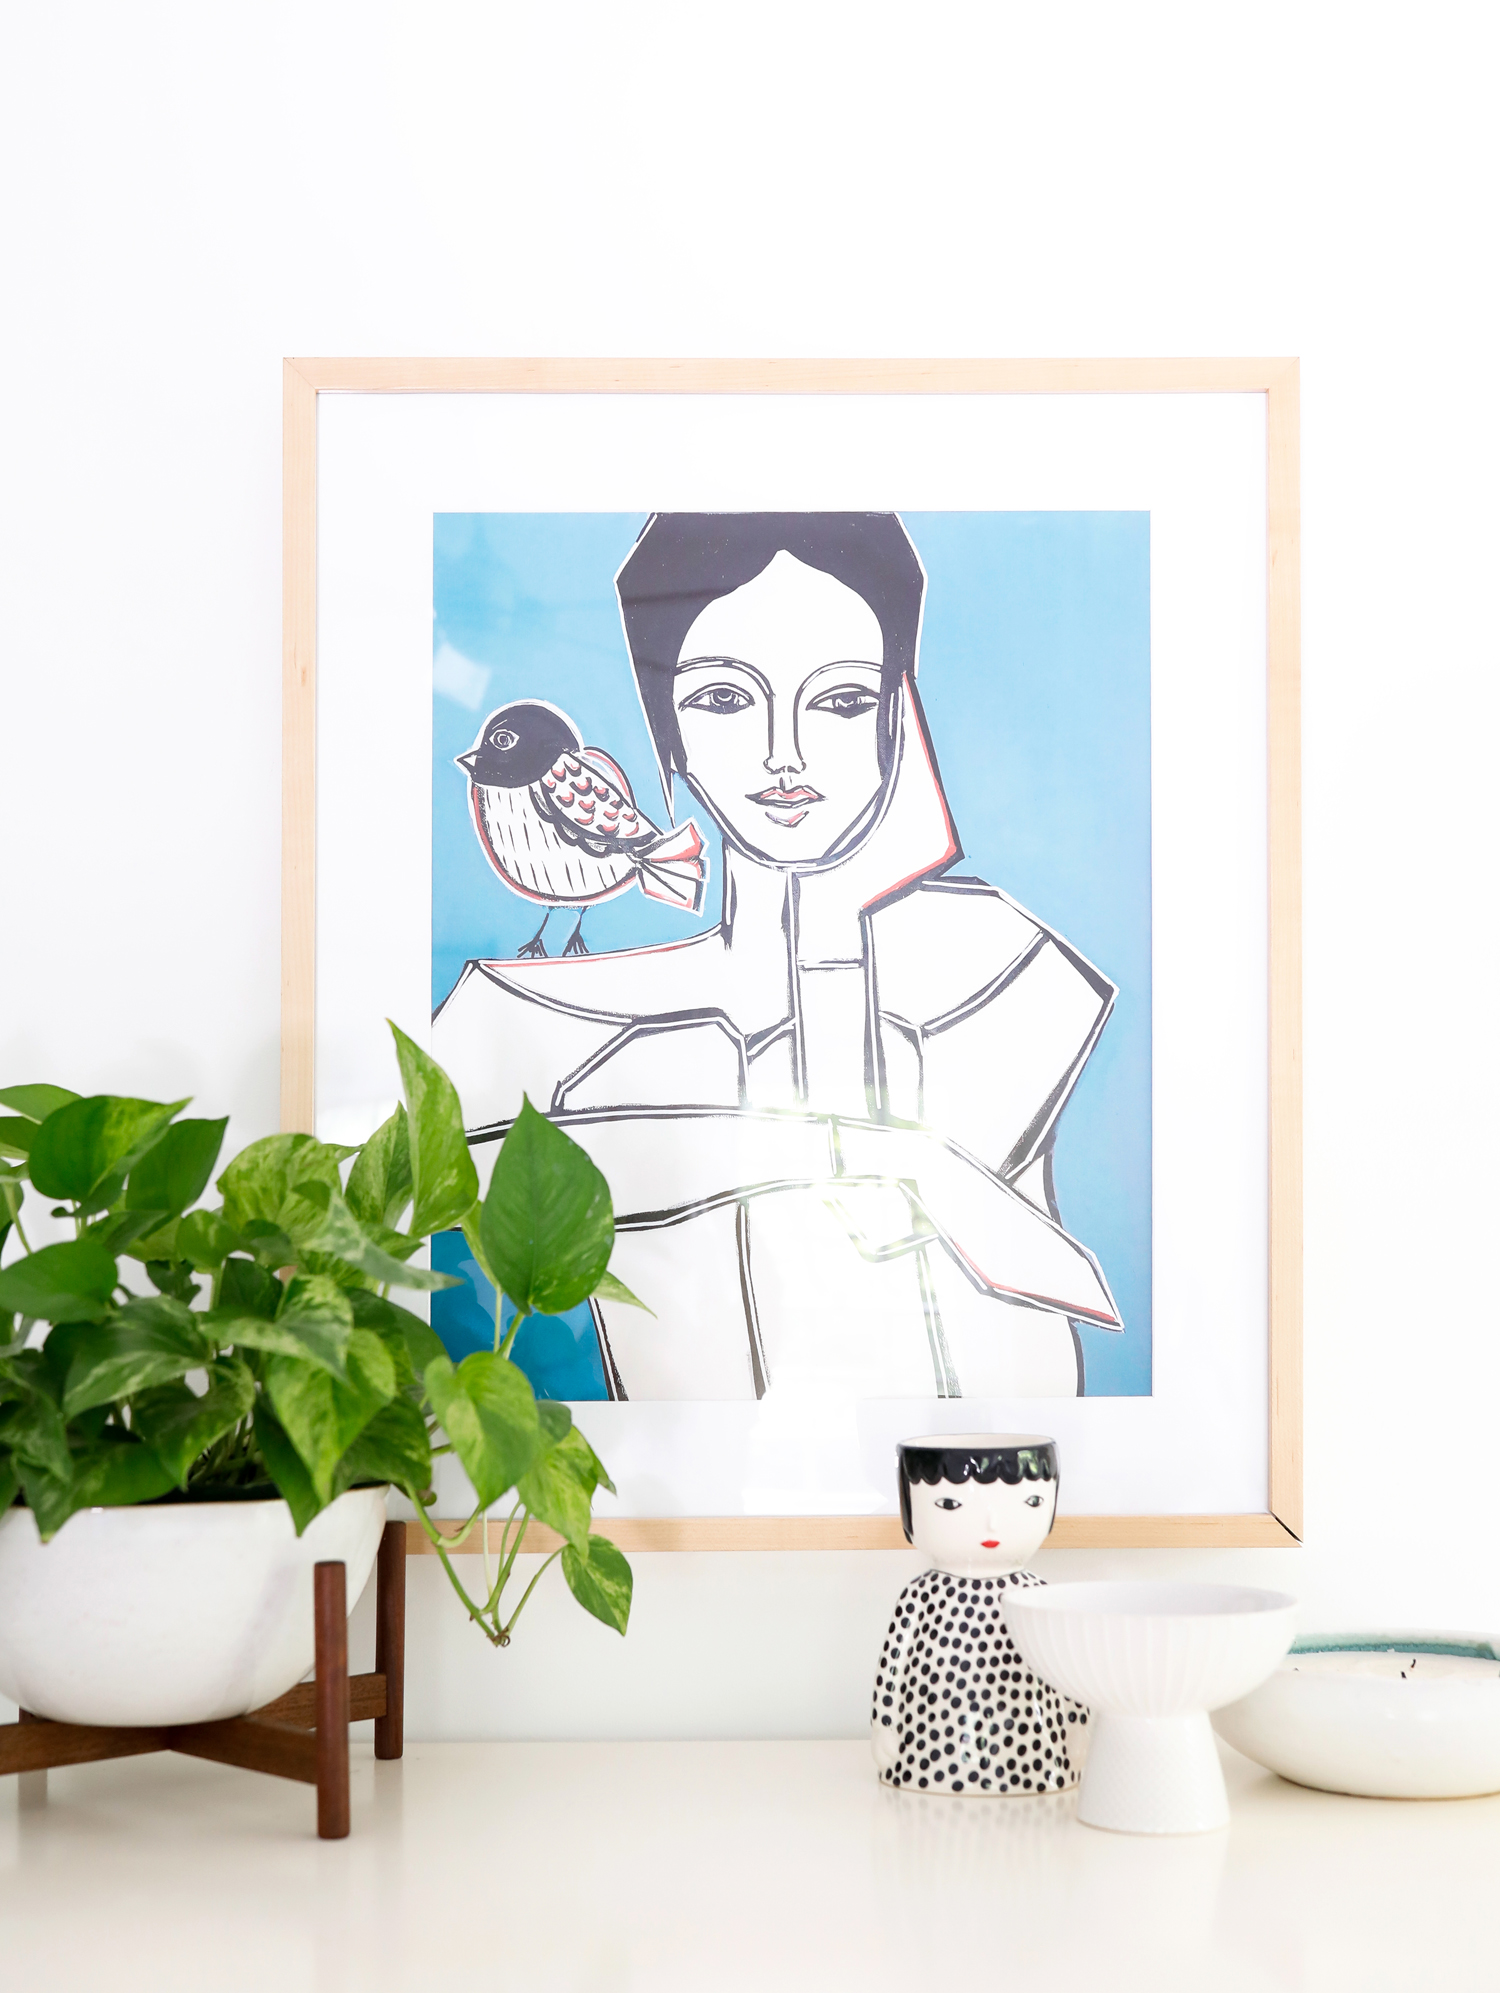 raleigh-interior-home-photographer-branding-business-headshot-photography-005